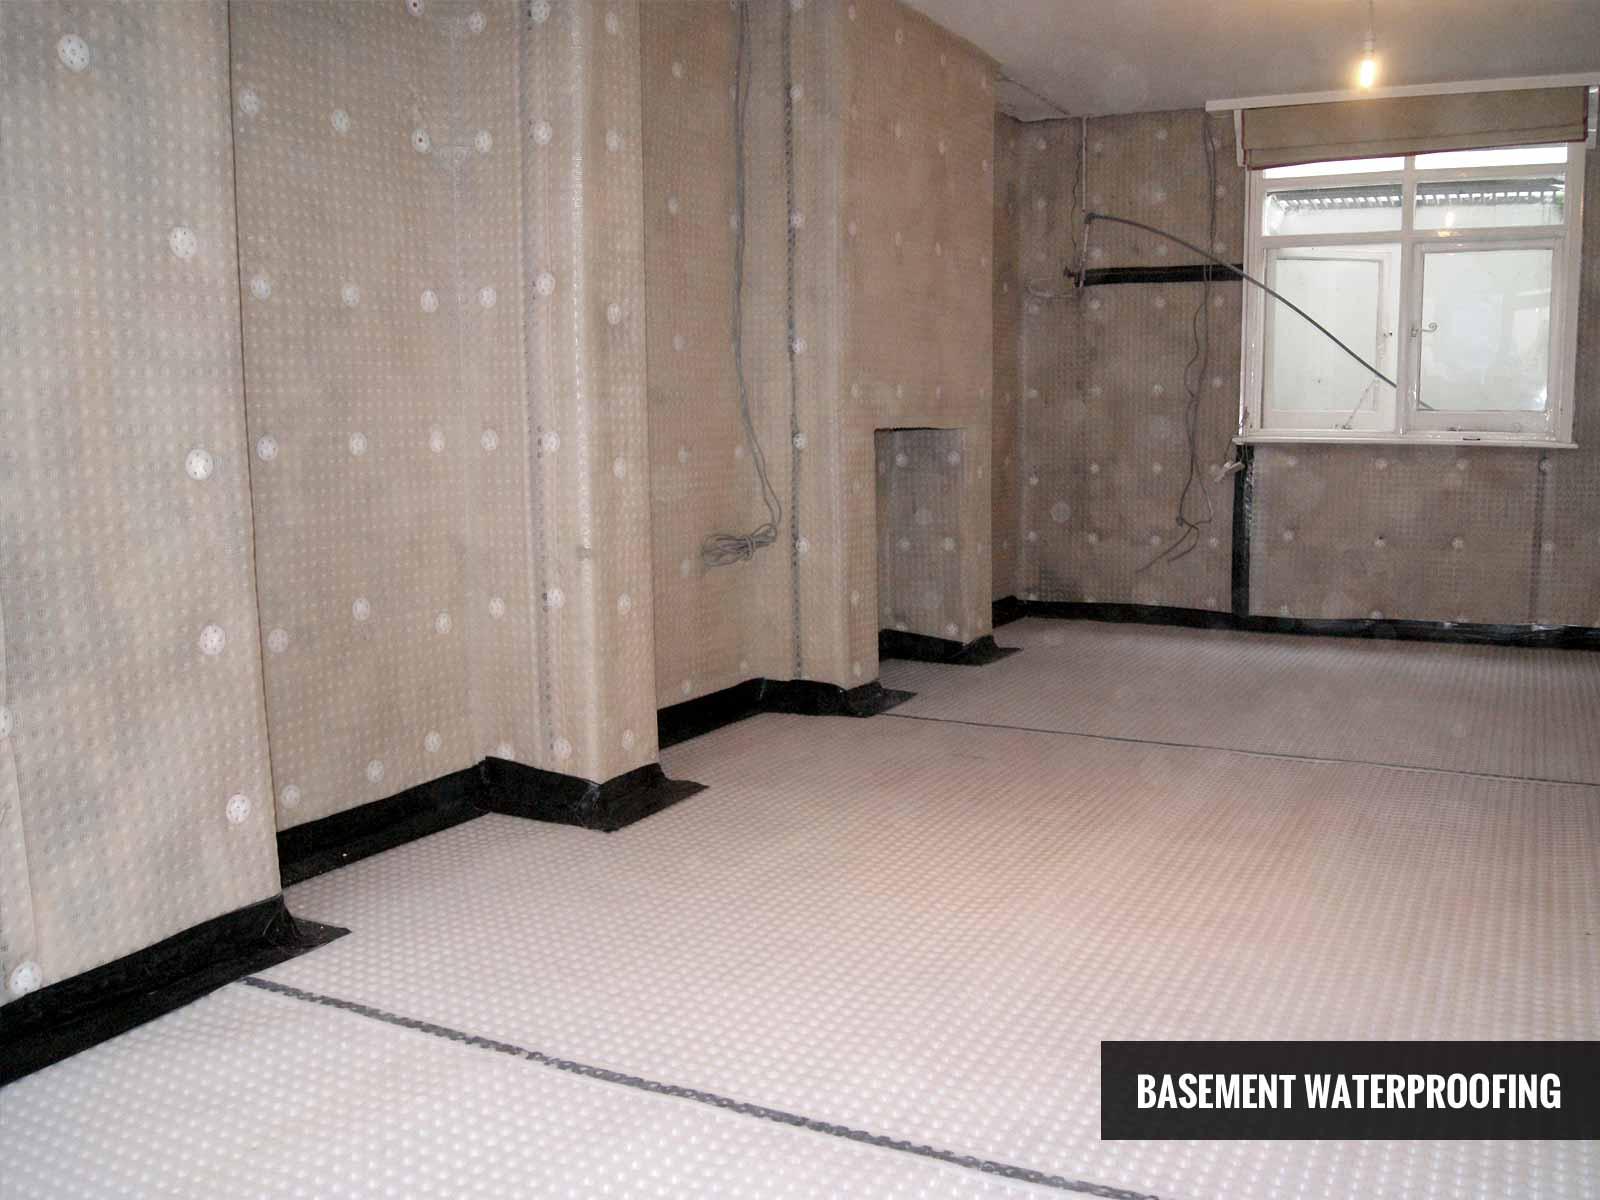 Basement Waterproofing (Tanking) in Dorset, Hampshire, Wiltshire & Devon